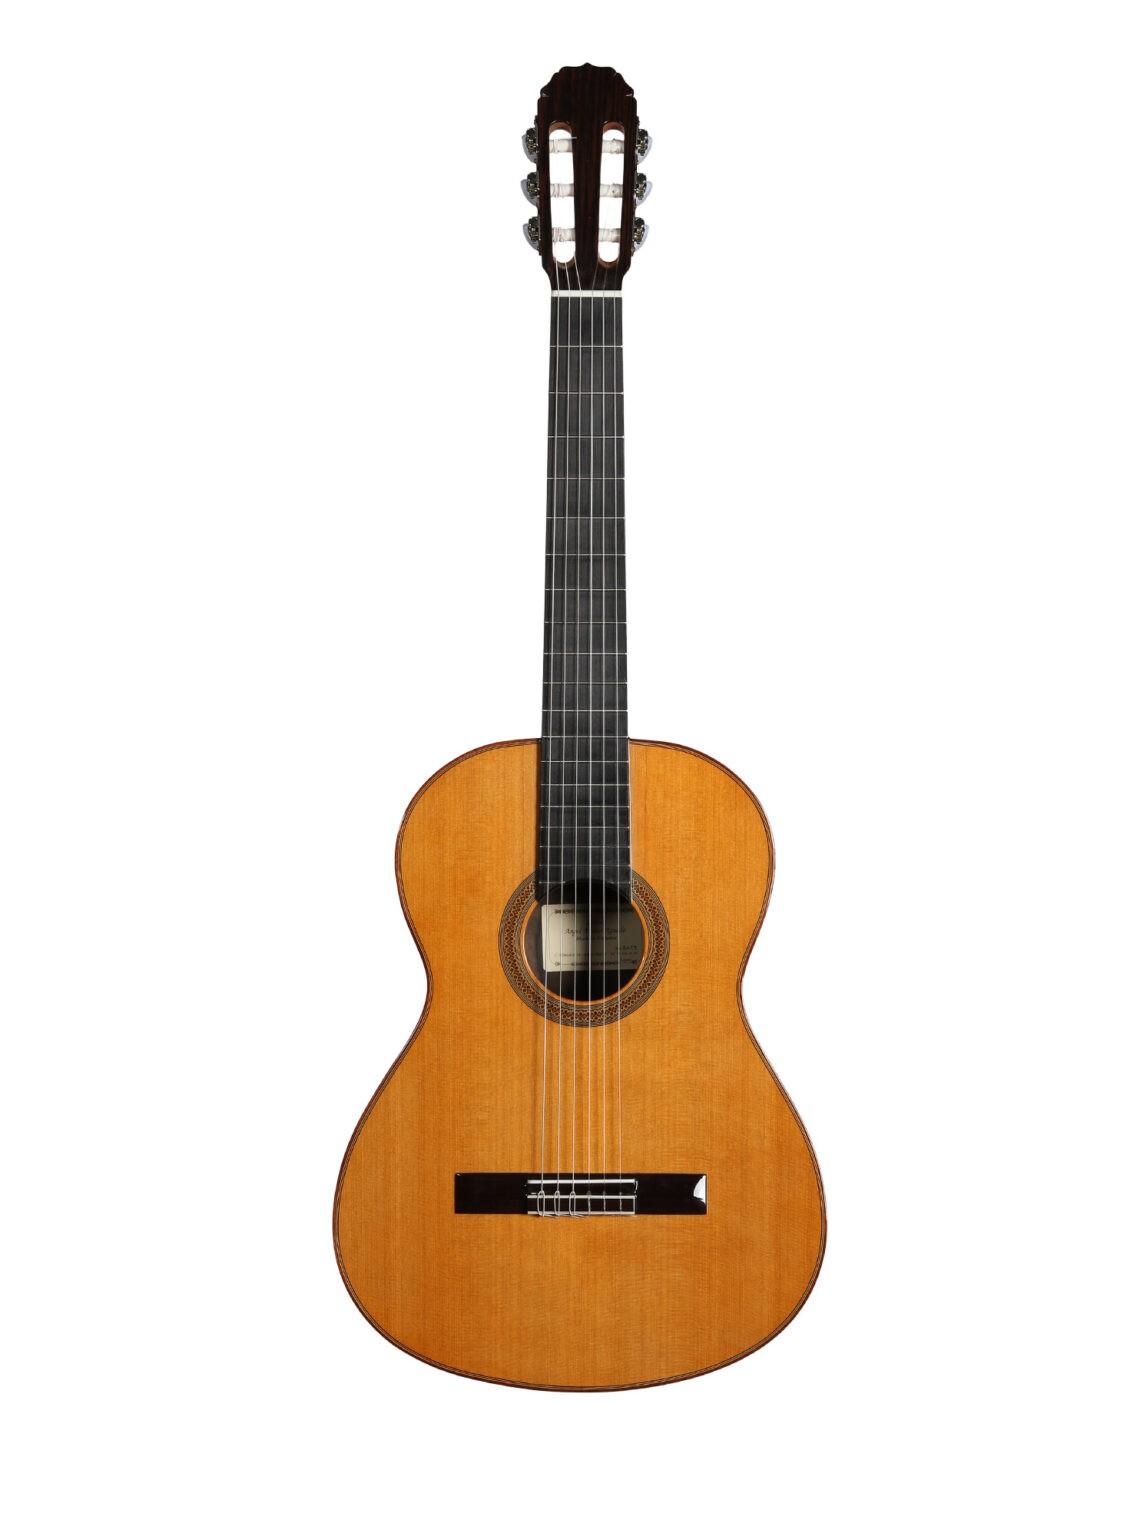 Guitarras de Angel Benito Aguado - Guitarras de estudio - Estudio Ziricote